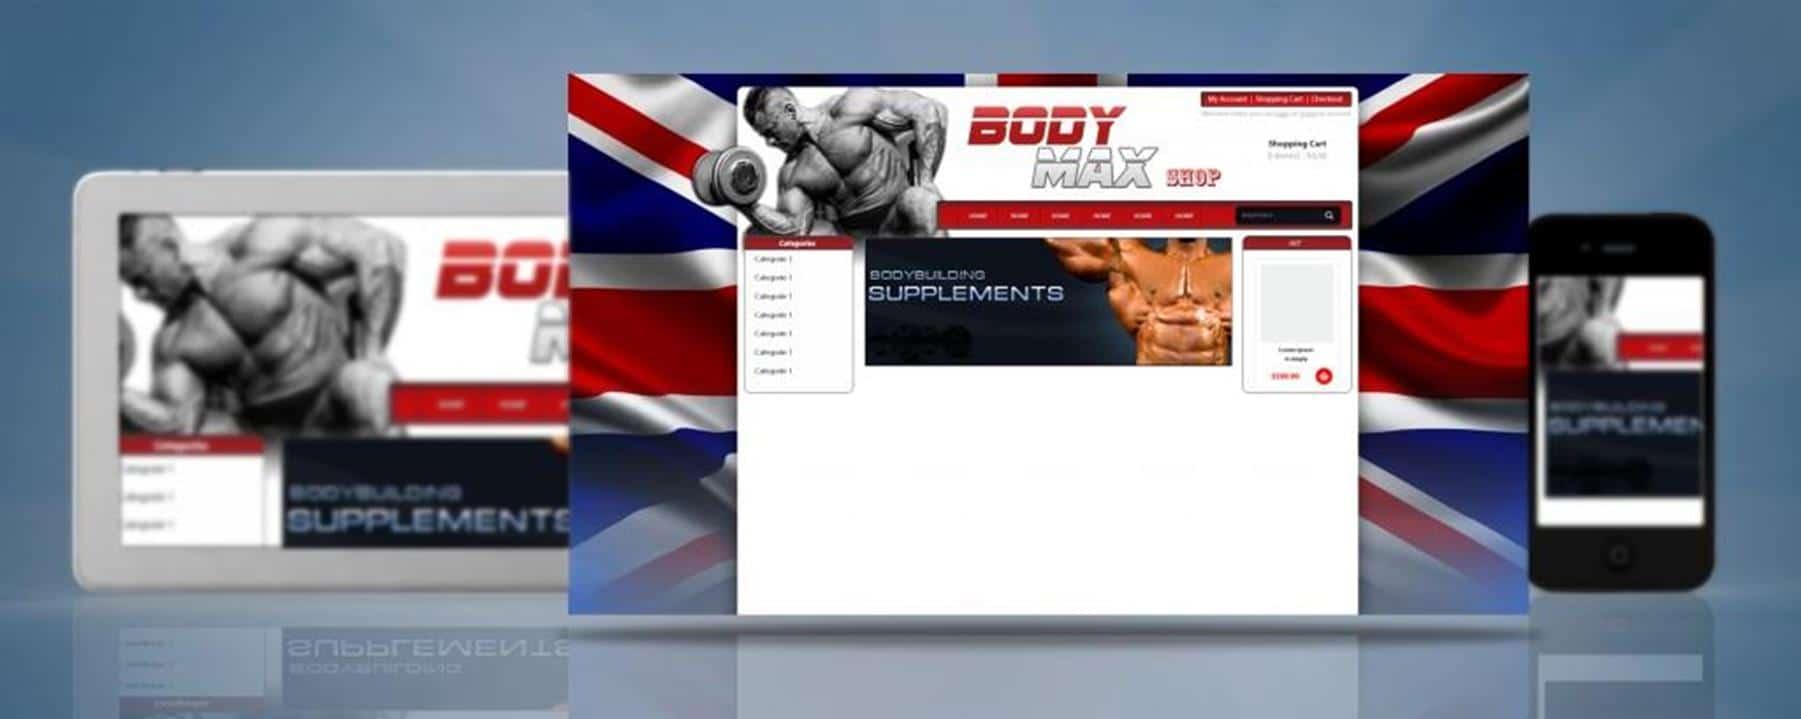 bodymax_webside